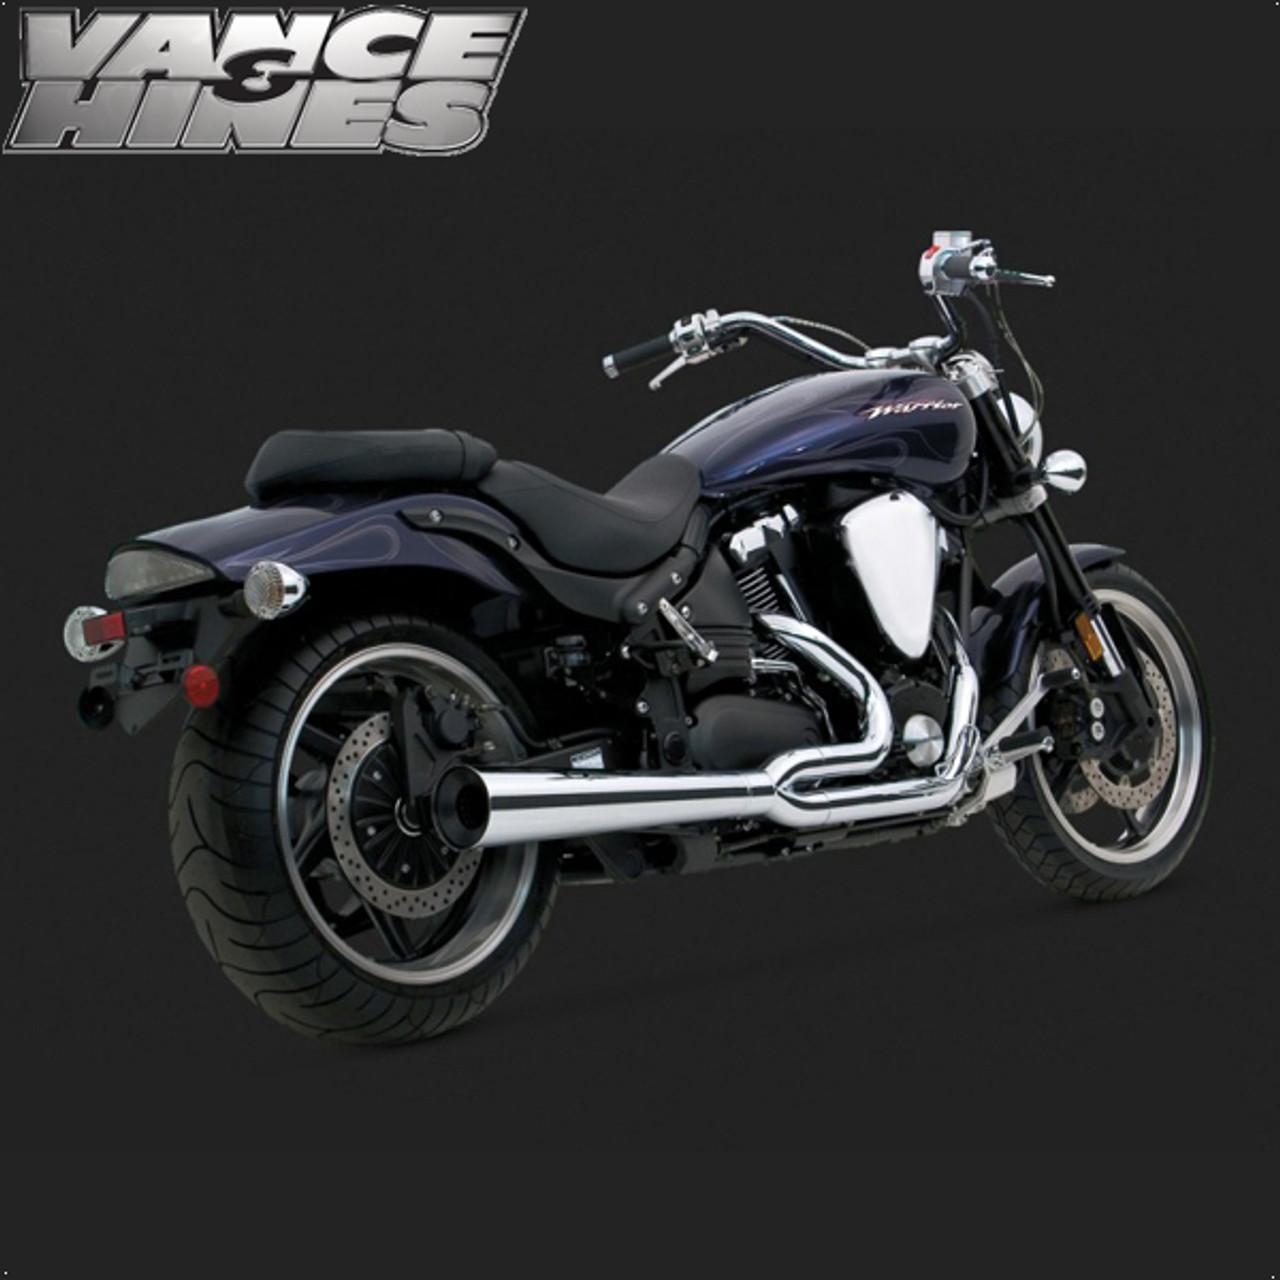 Vance Hines Pro Pipe Full Exaust System Yamaha Xv1700 Road Star Warrior 02 09